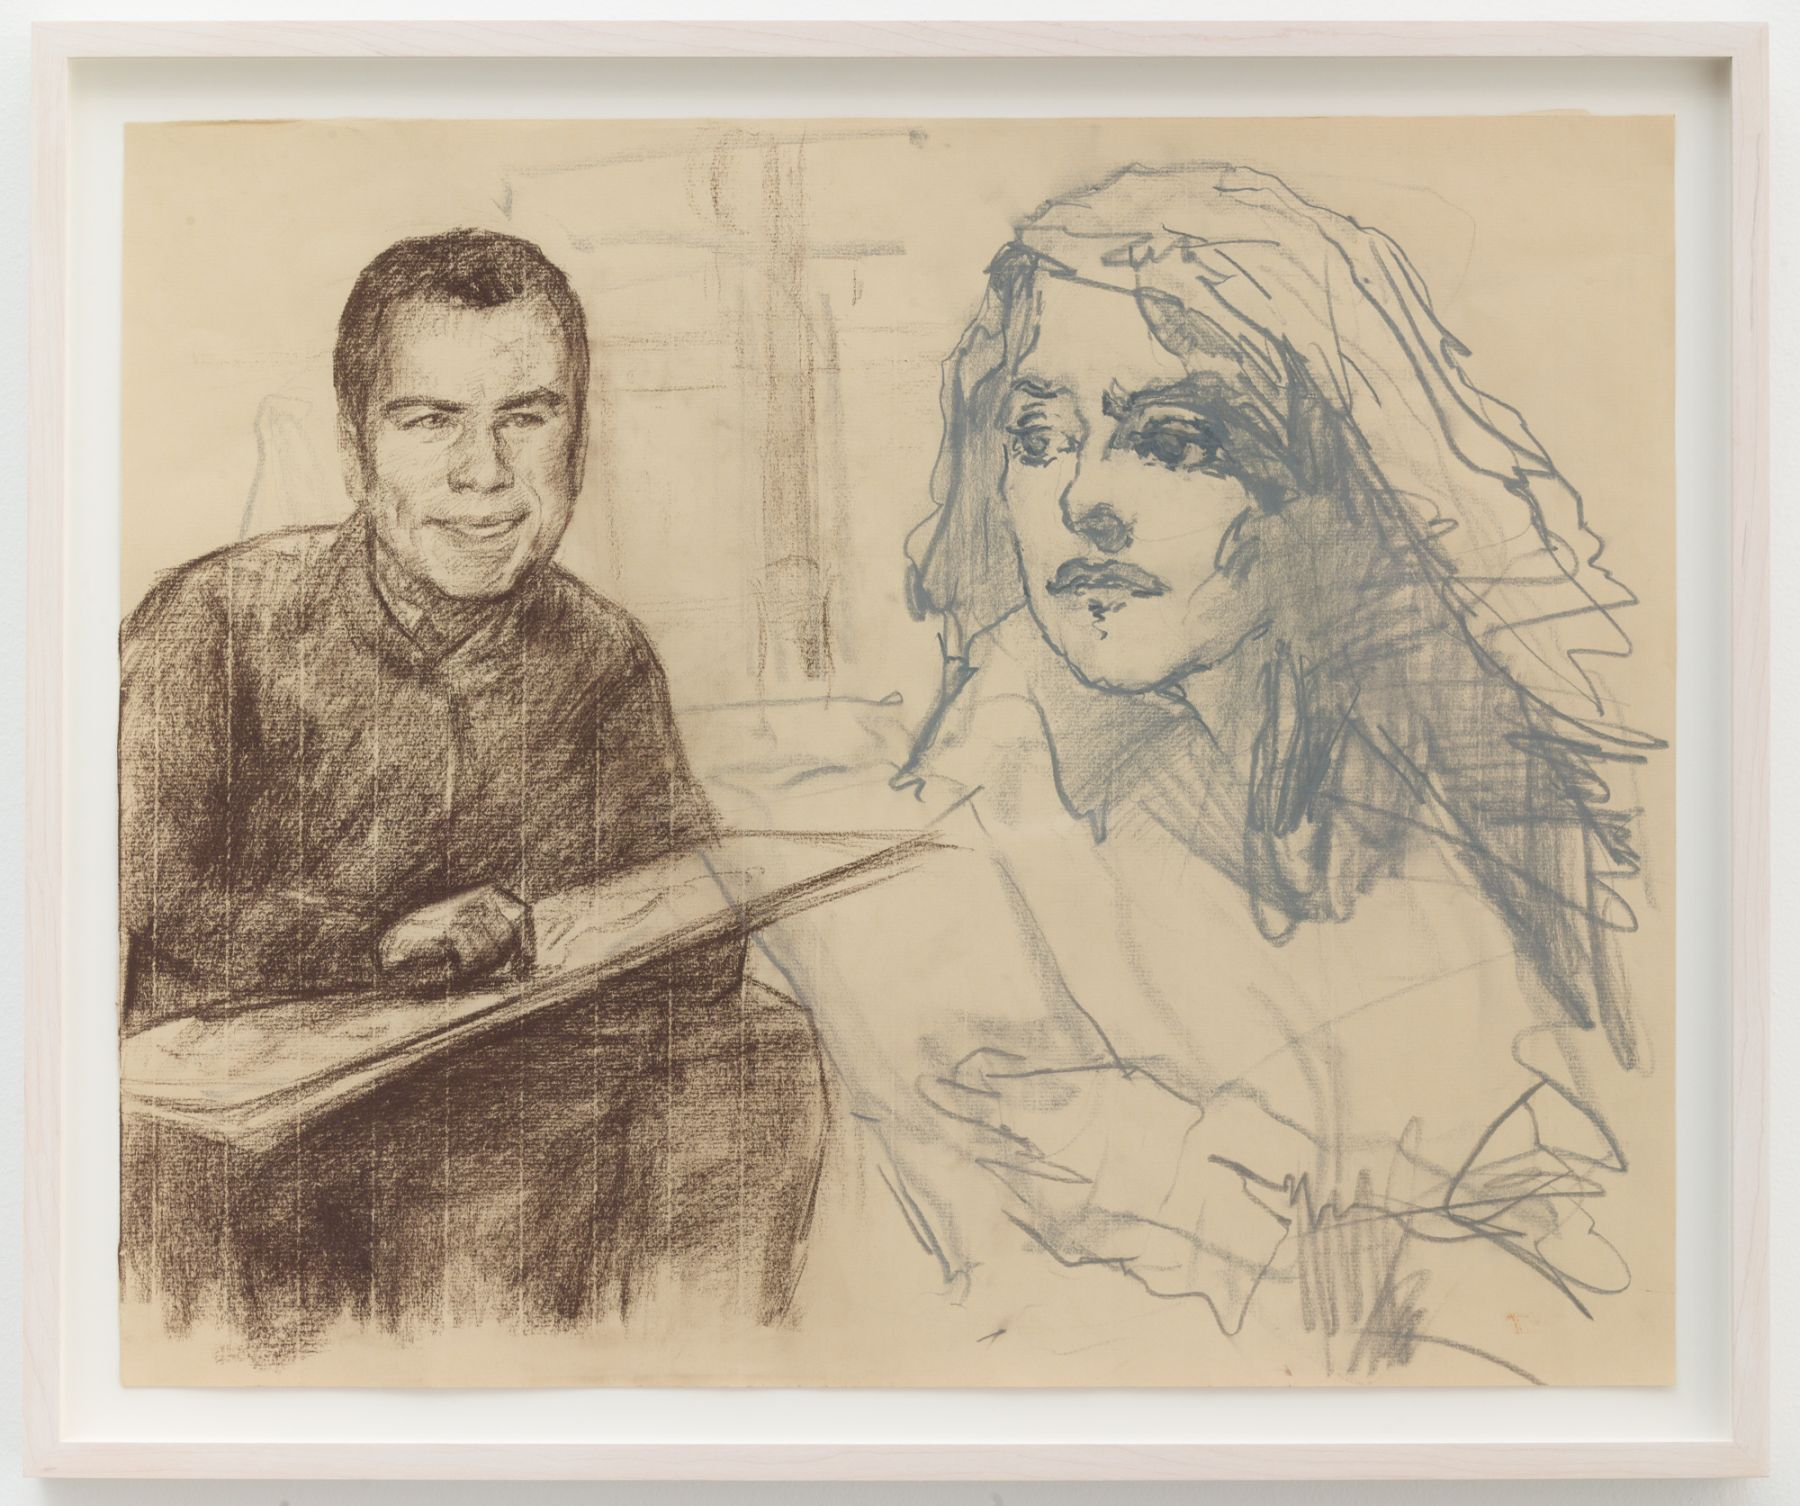 Christian Jankowski, Isabelle Huppert - John Travolta